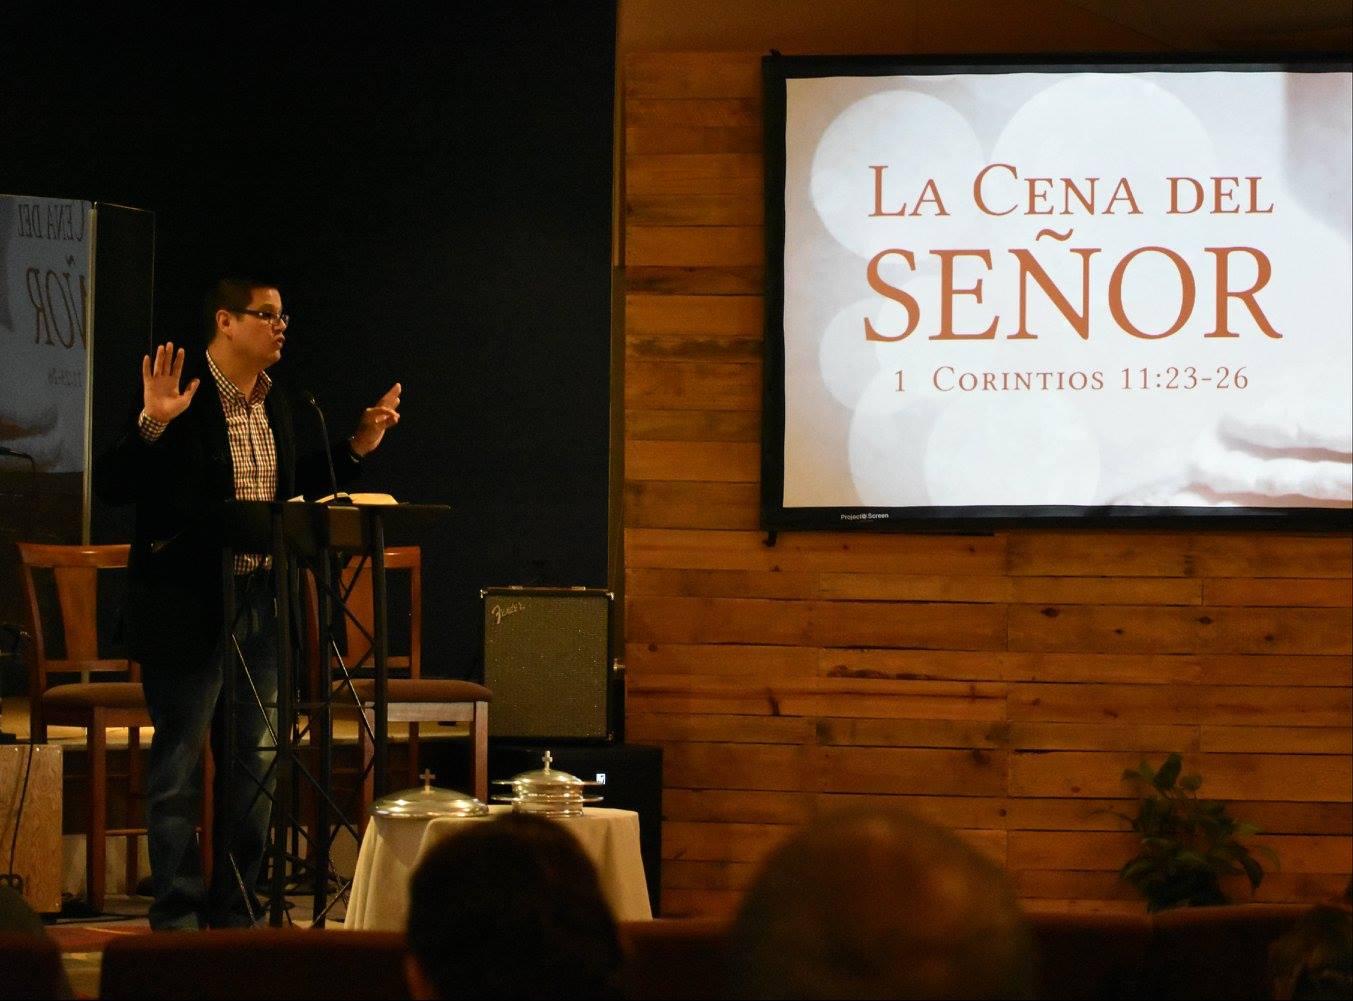 Pastor Juan M. Ocampo